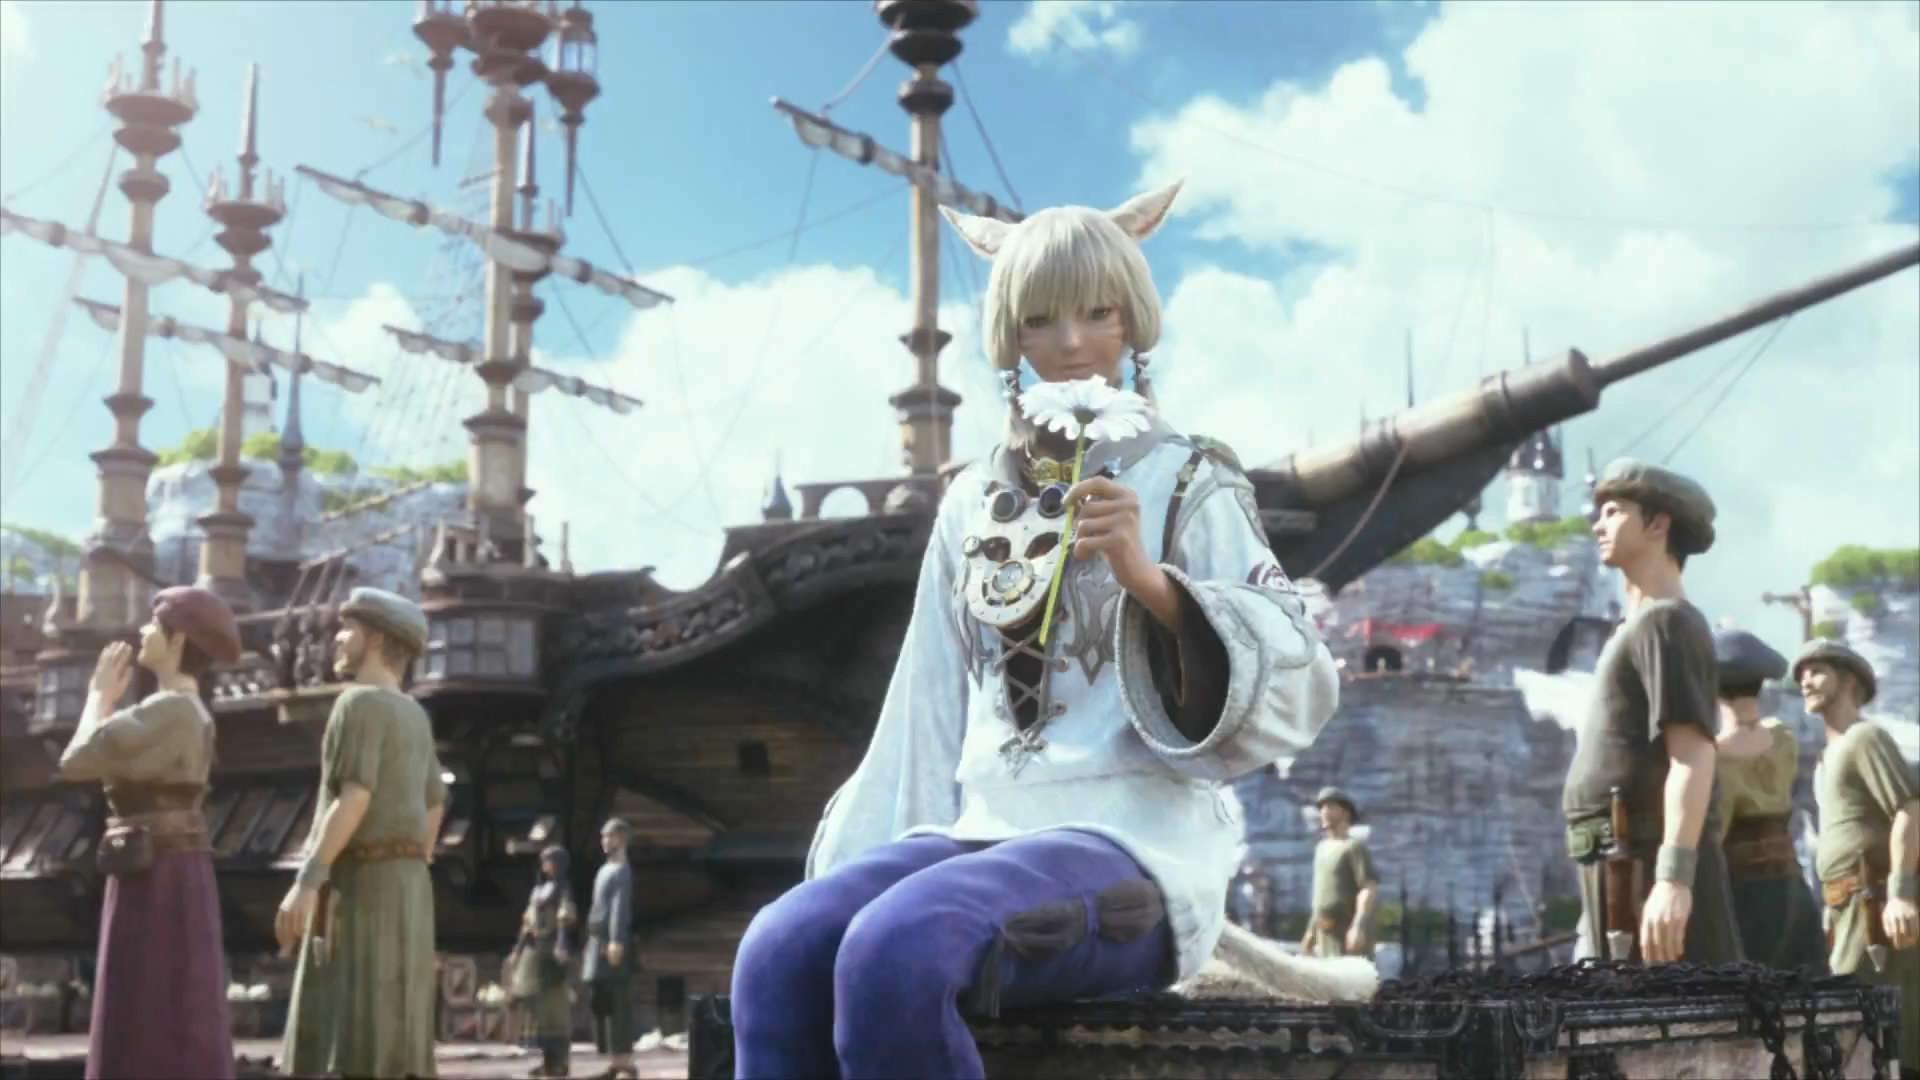 Final Fantasy XIV – A Realm Reborn